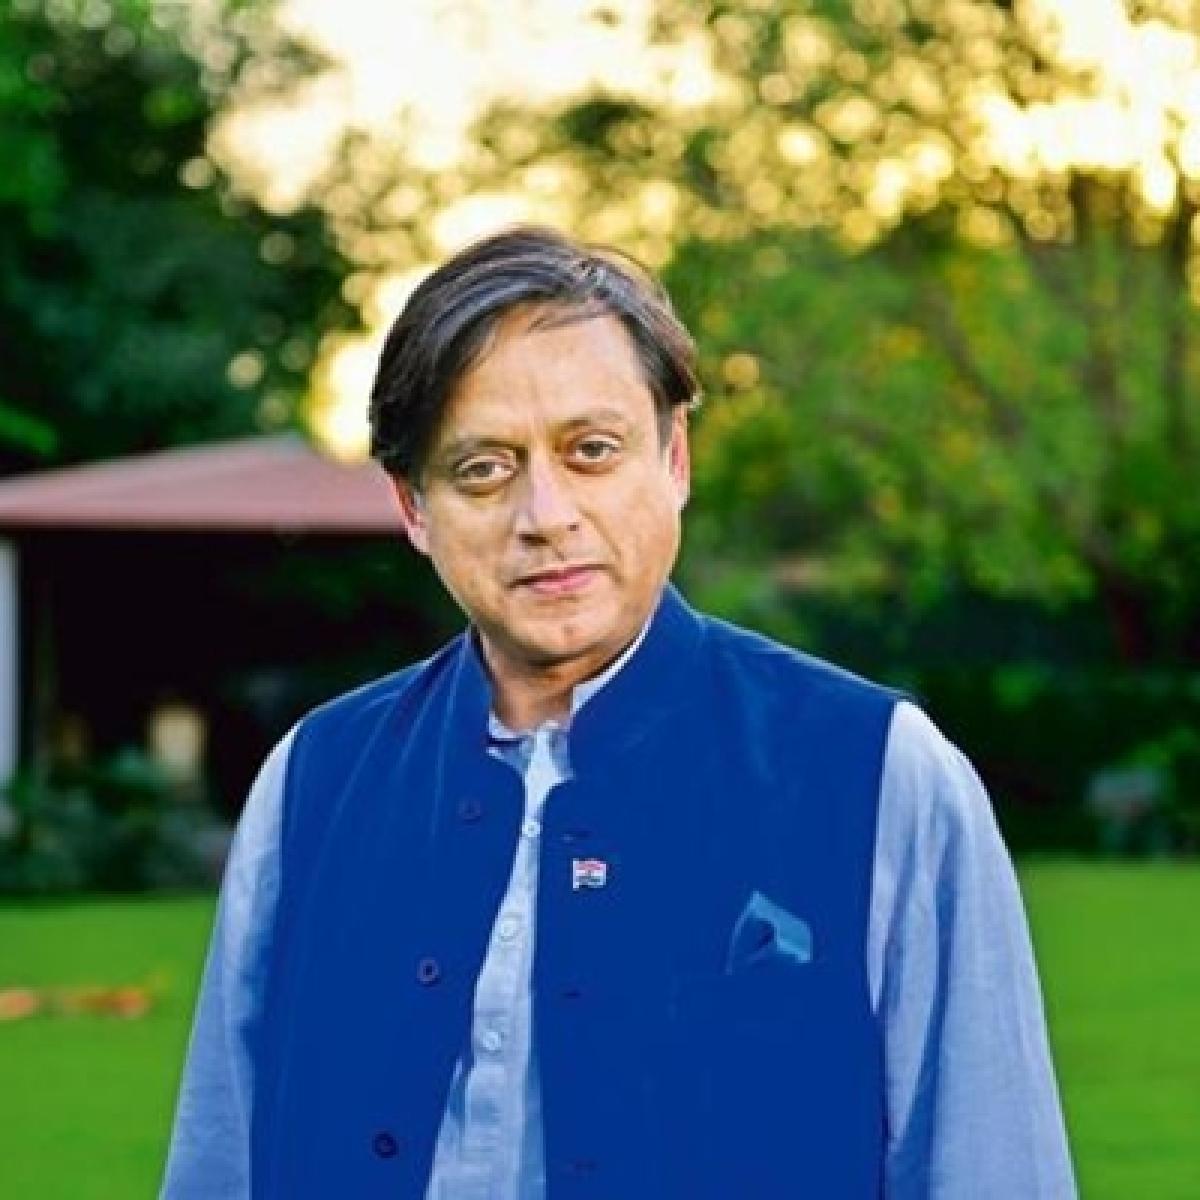 Delhi court allows Shashi Tharoor to travel abroad